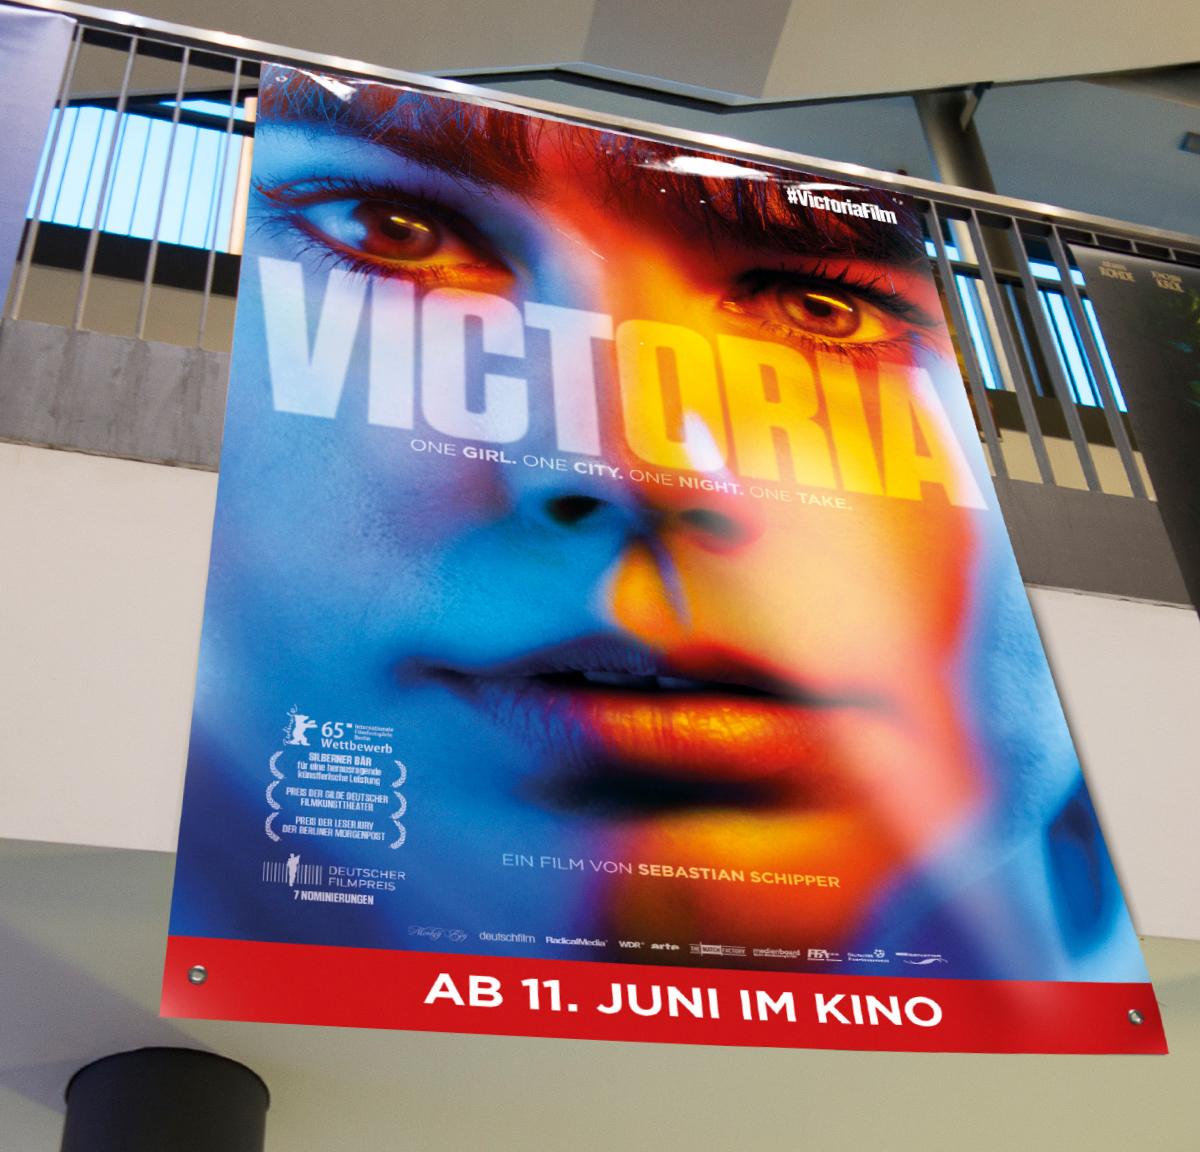 Vic_banner